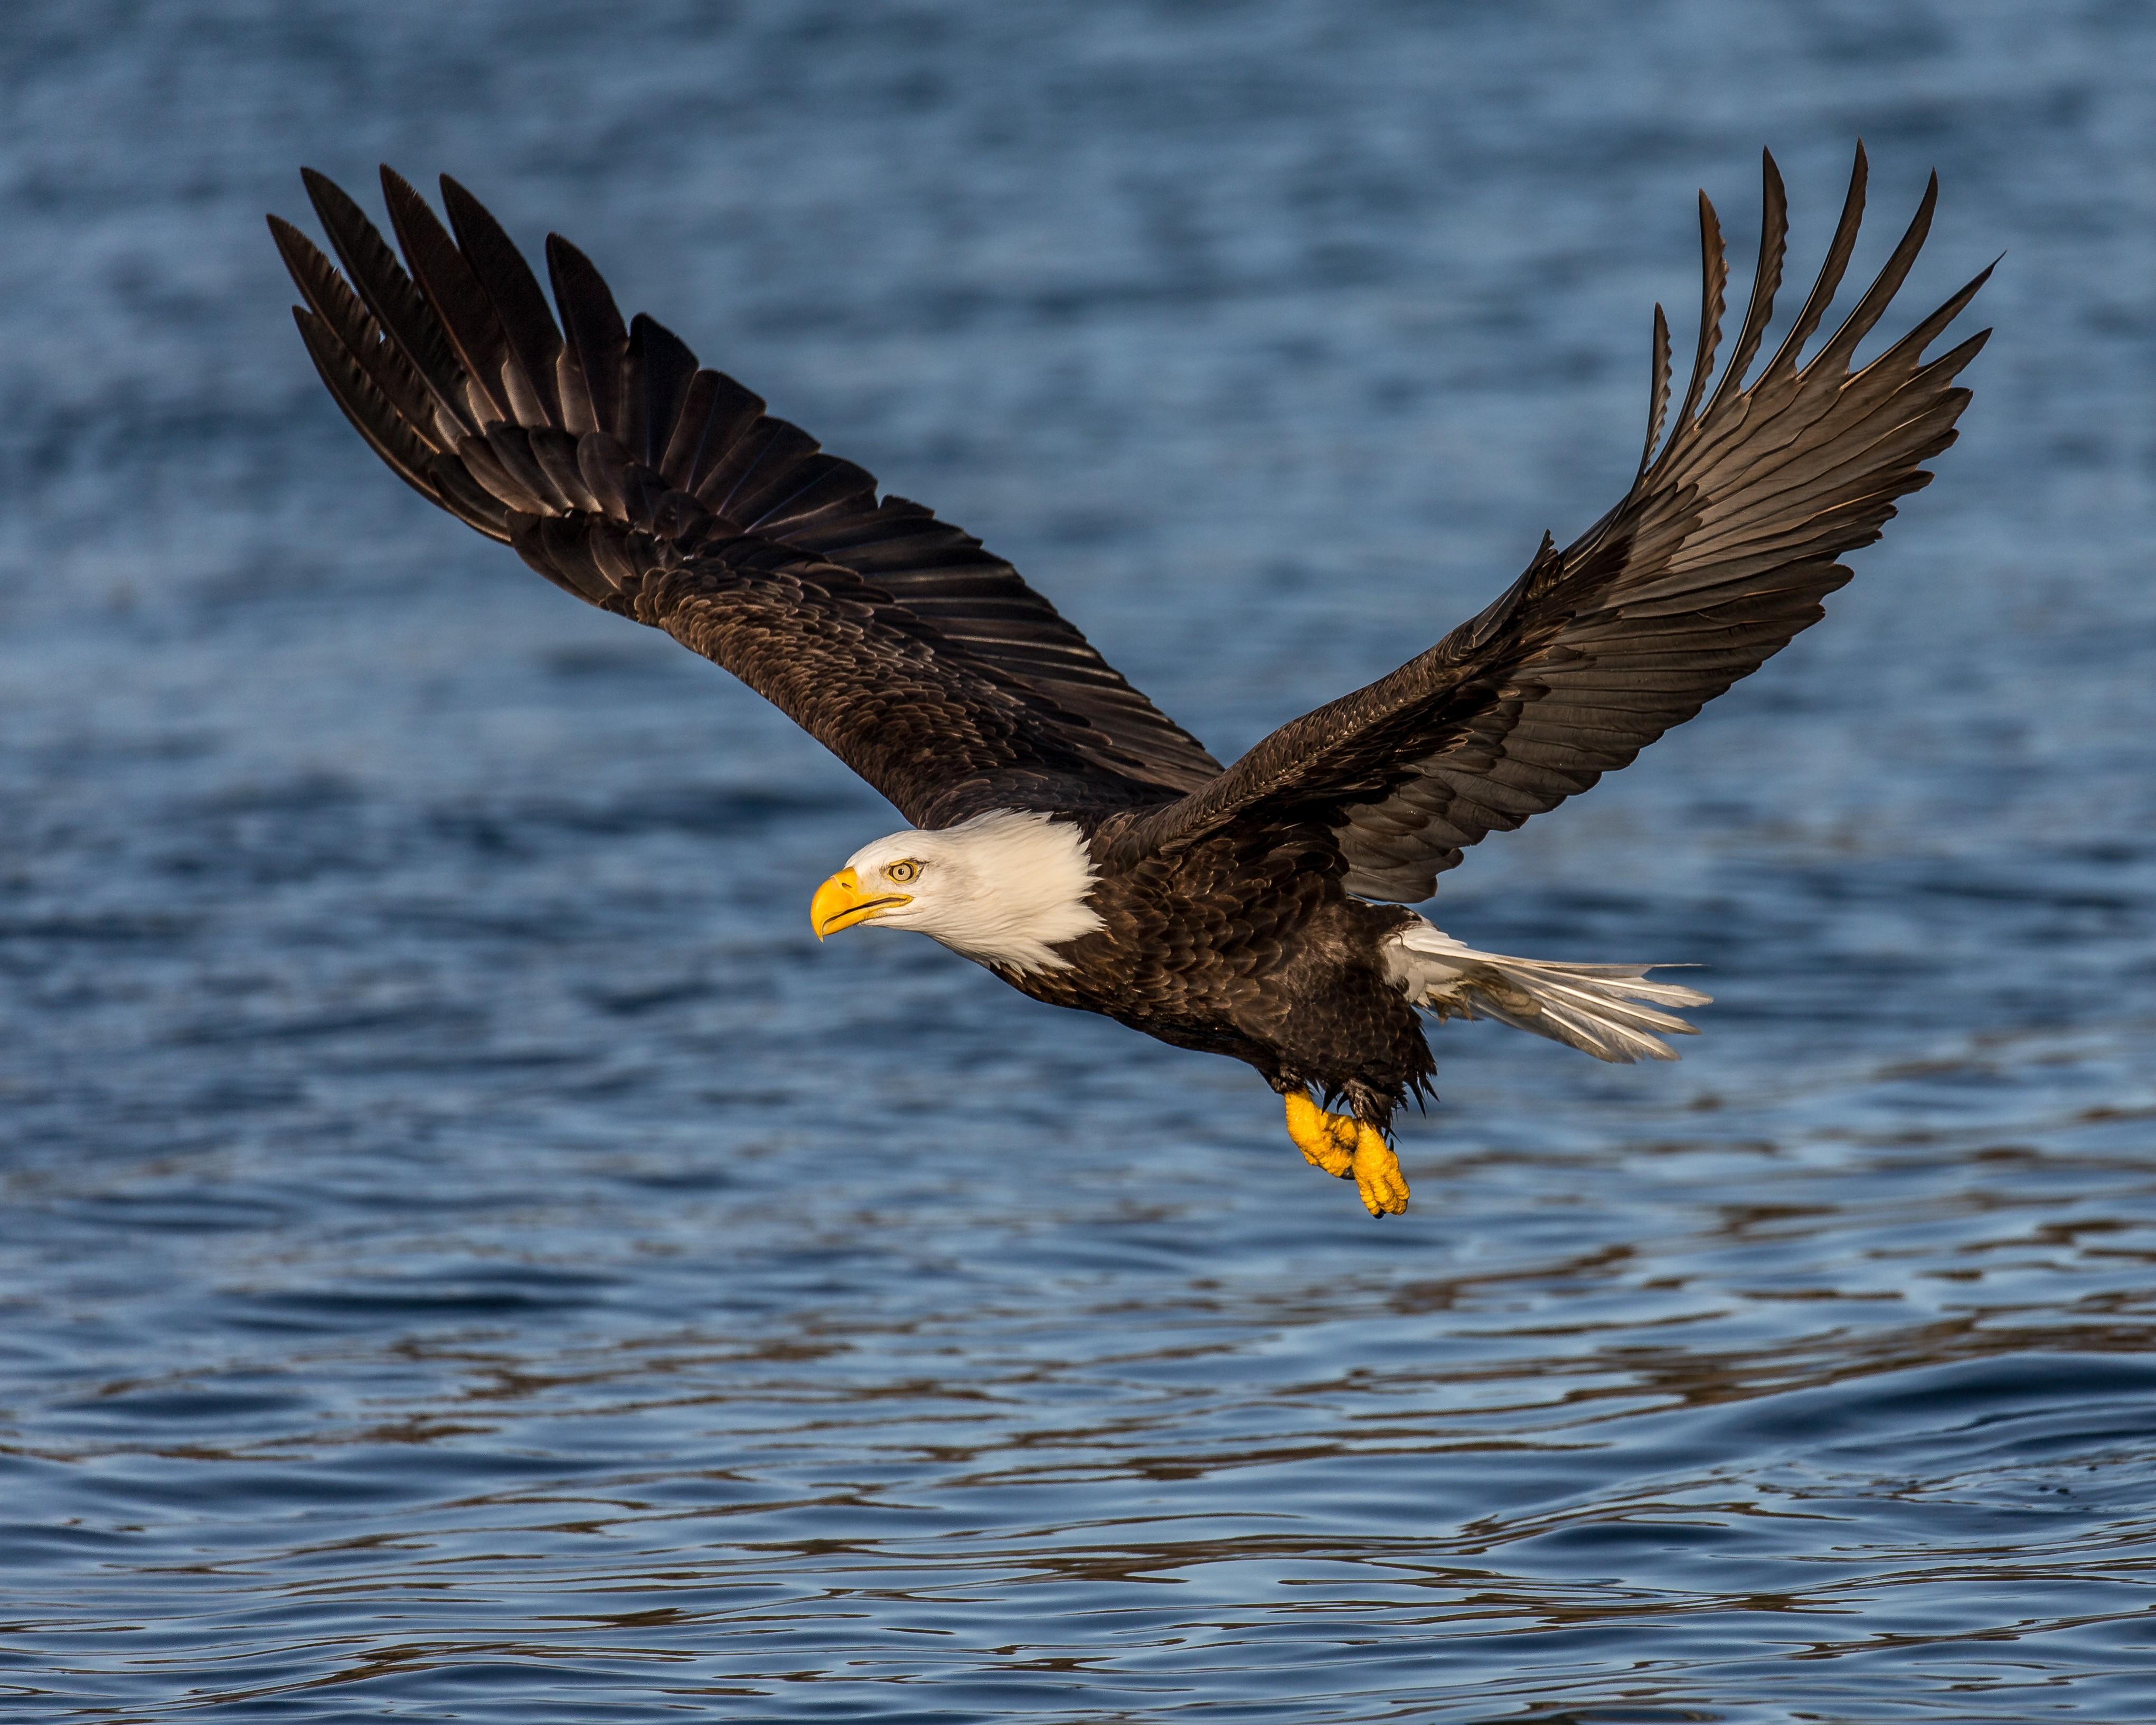 фото и картинки парящего орла вишенкой смайлики картинки